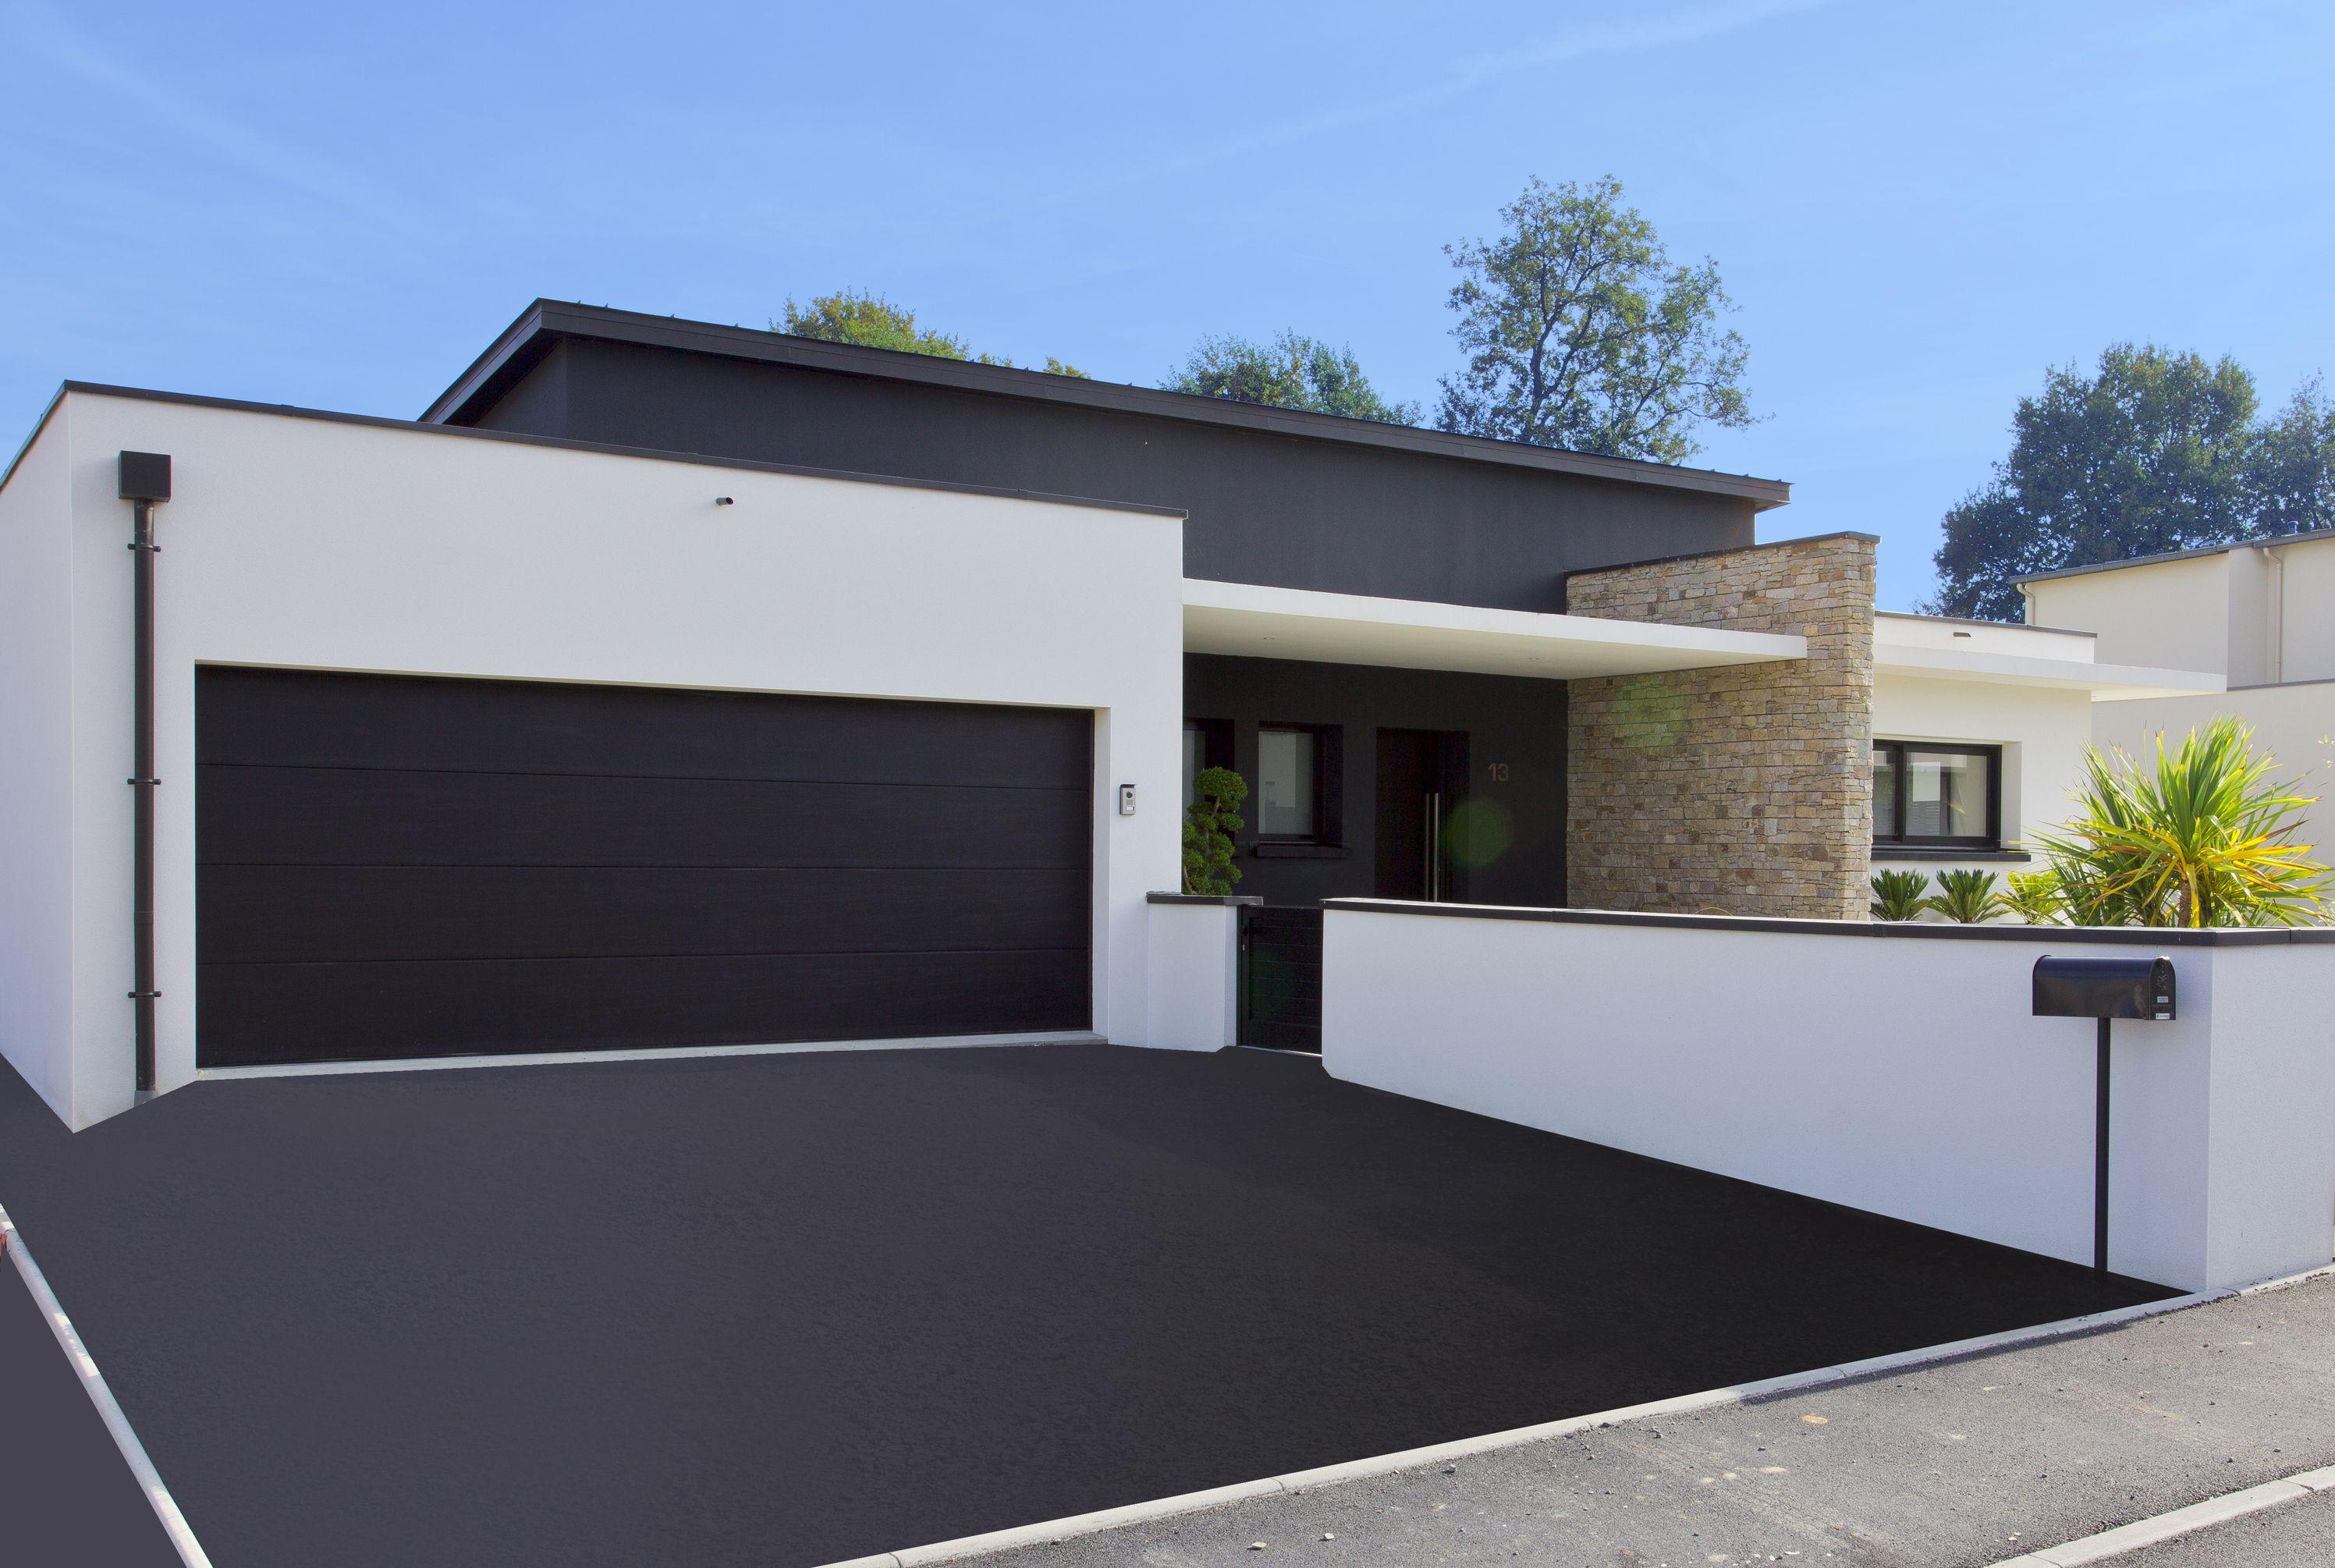 Detolux Porte Garage Maison Design Portes